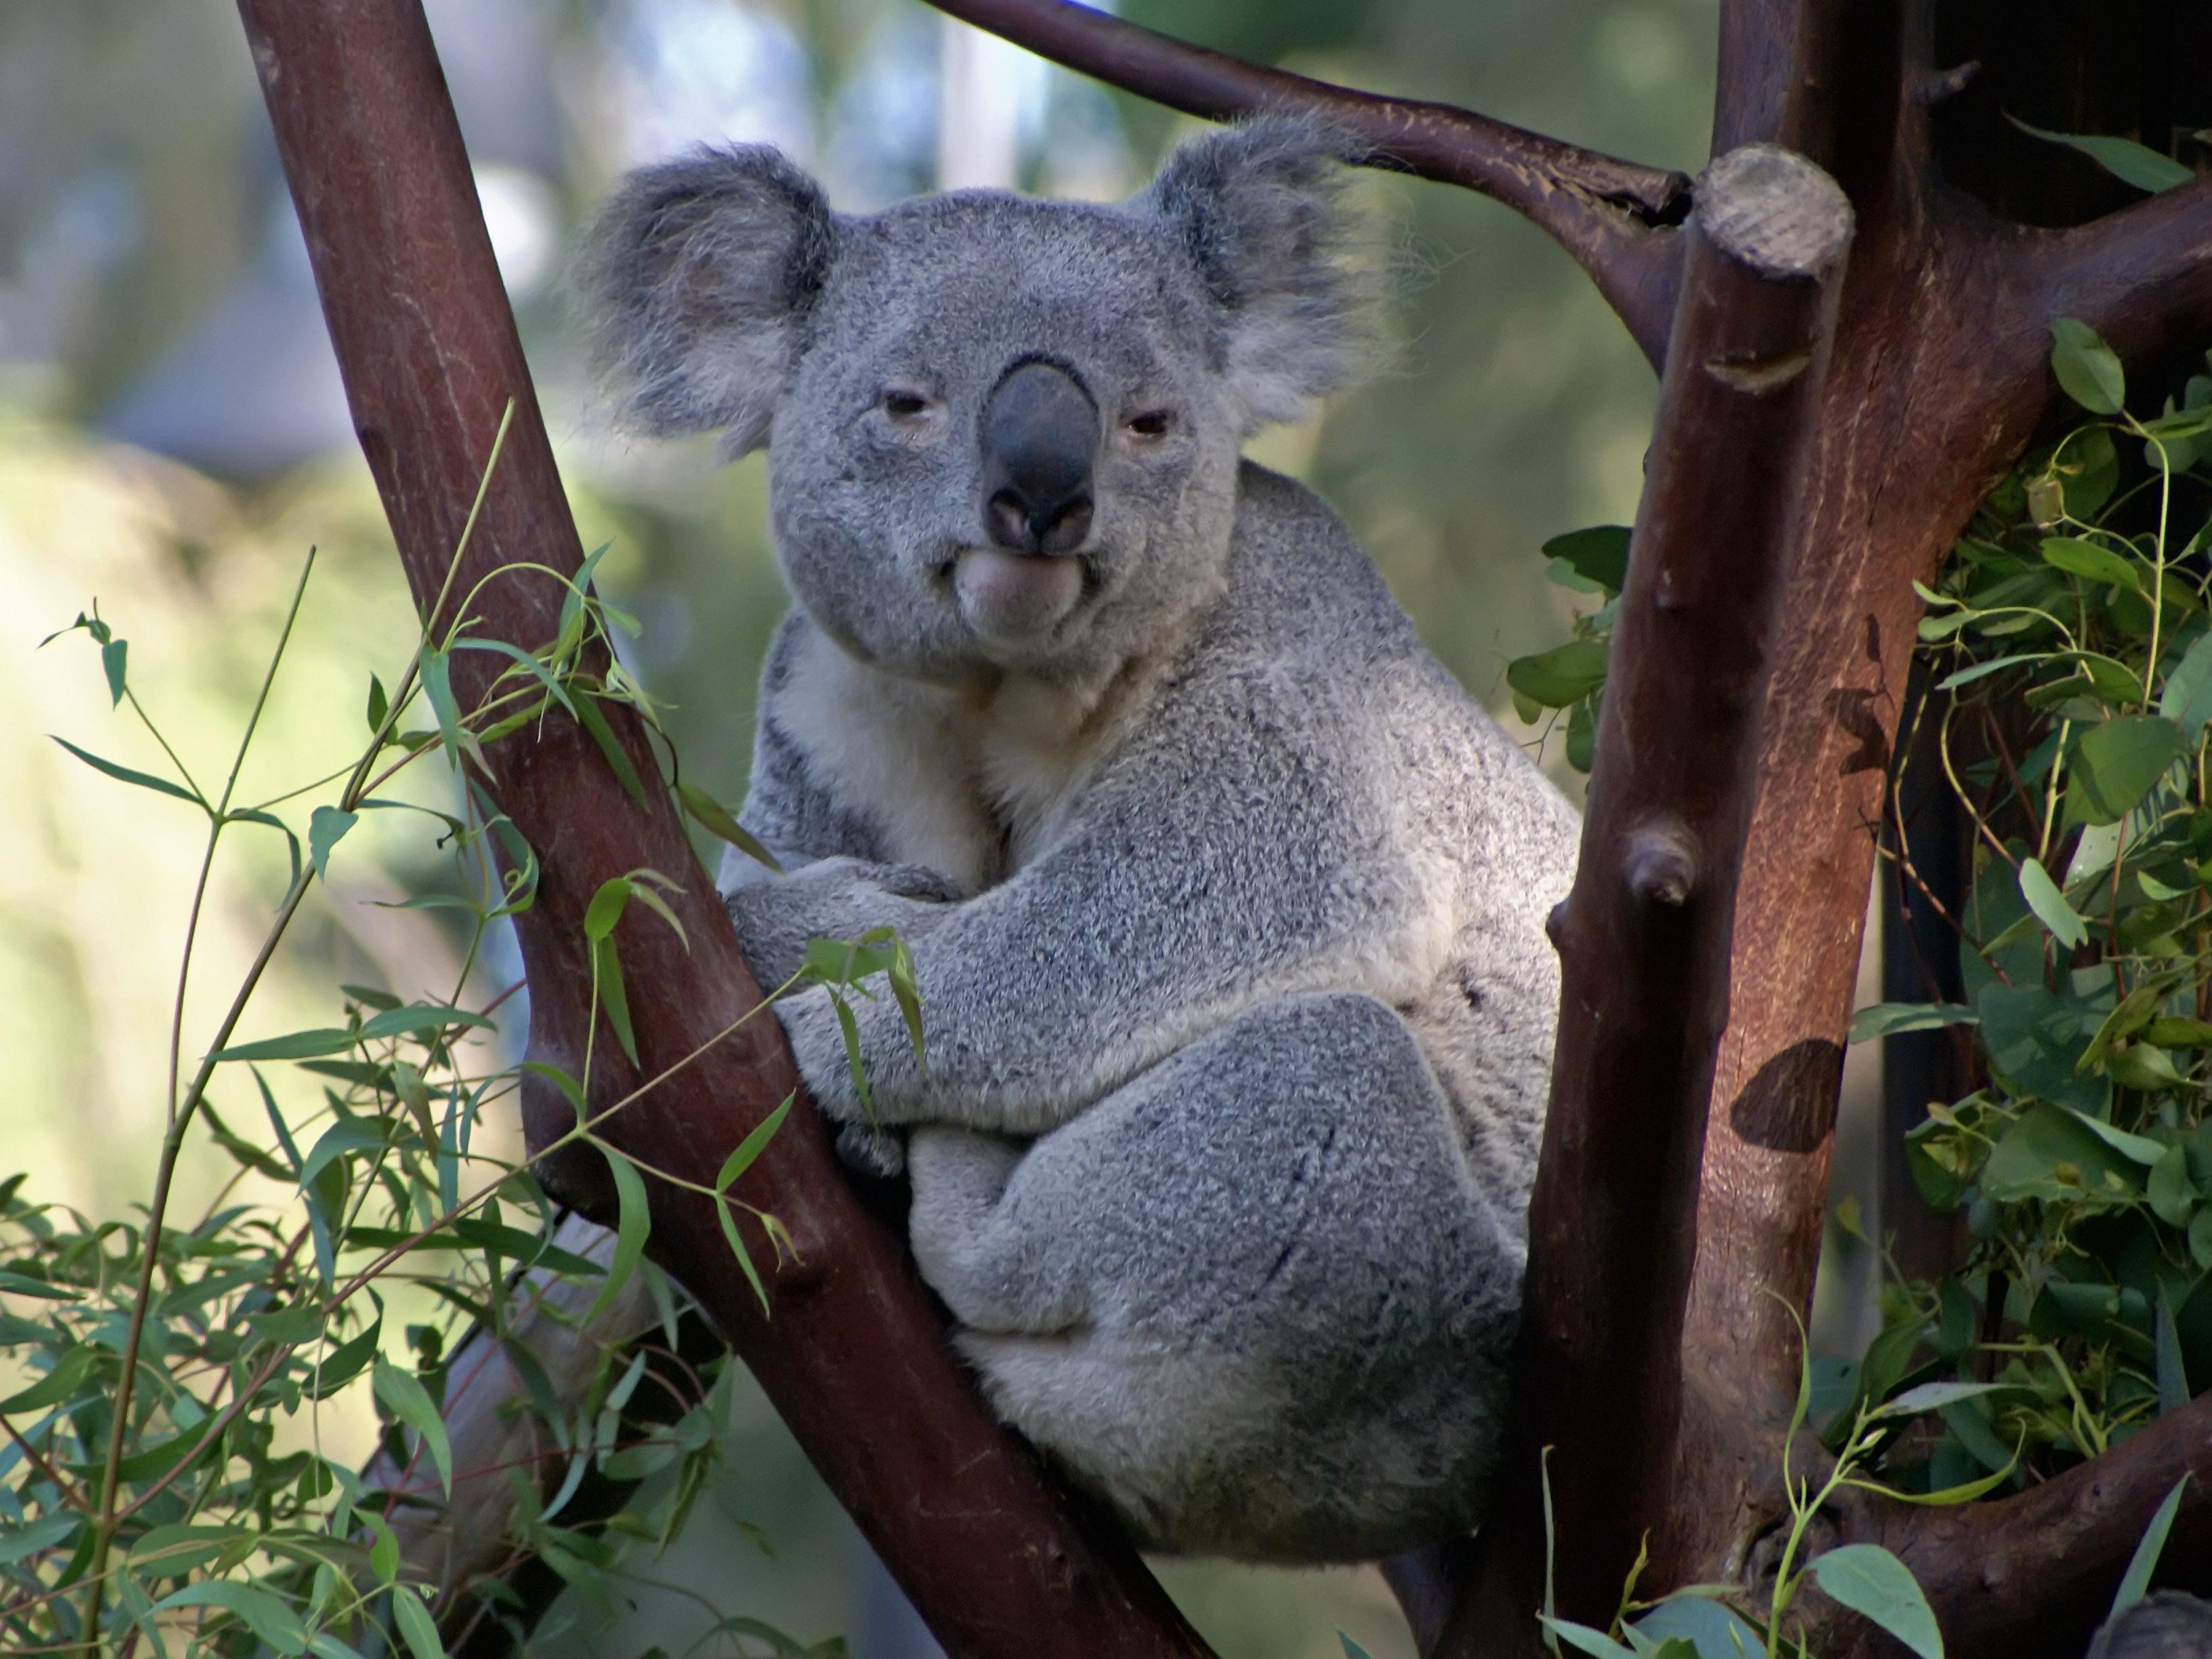 smiling koala picture - HD3260×2445